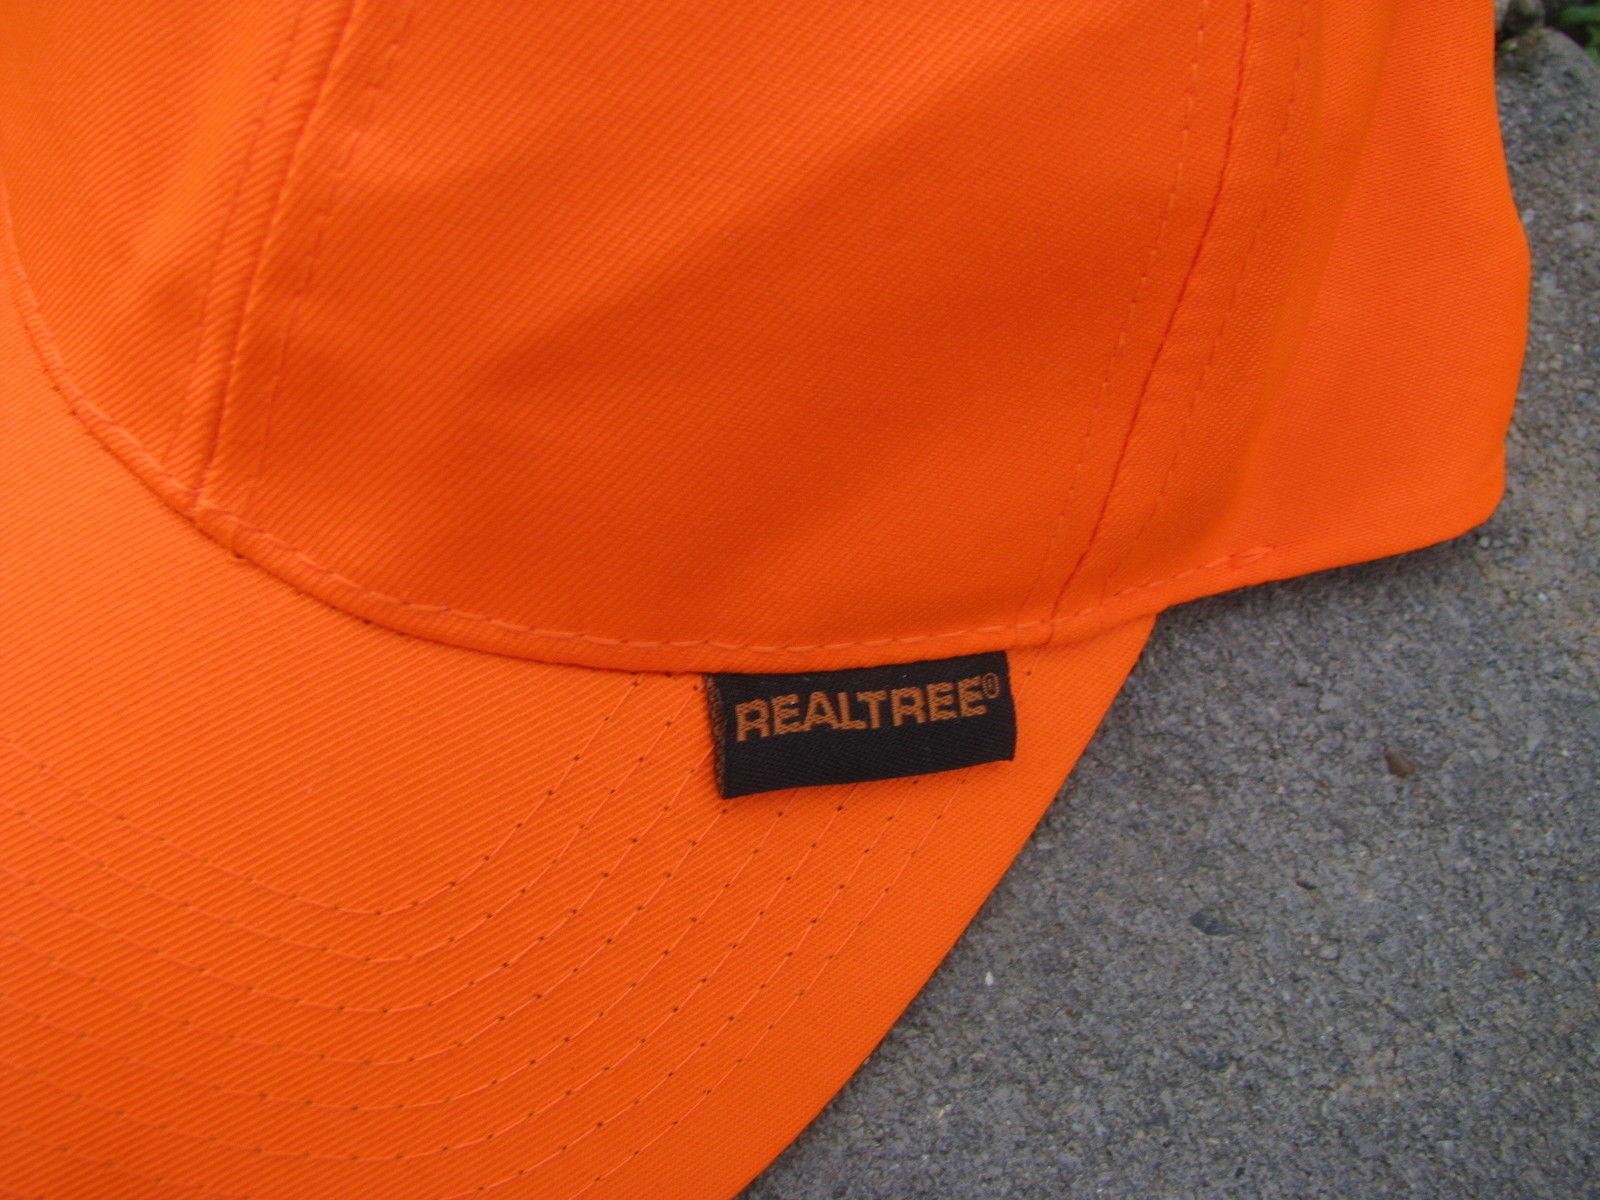 VTG Baseball Cap REALTREE ORANGE PLain no design trucker hat